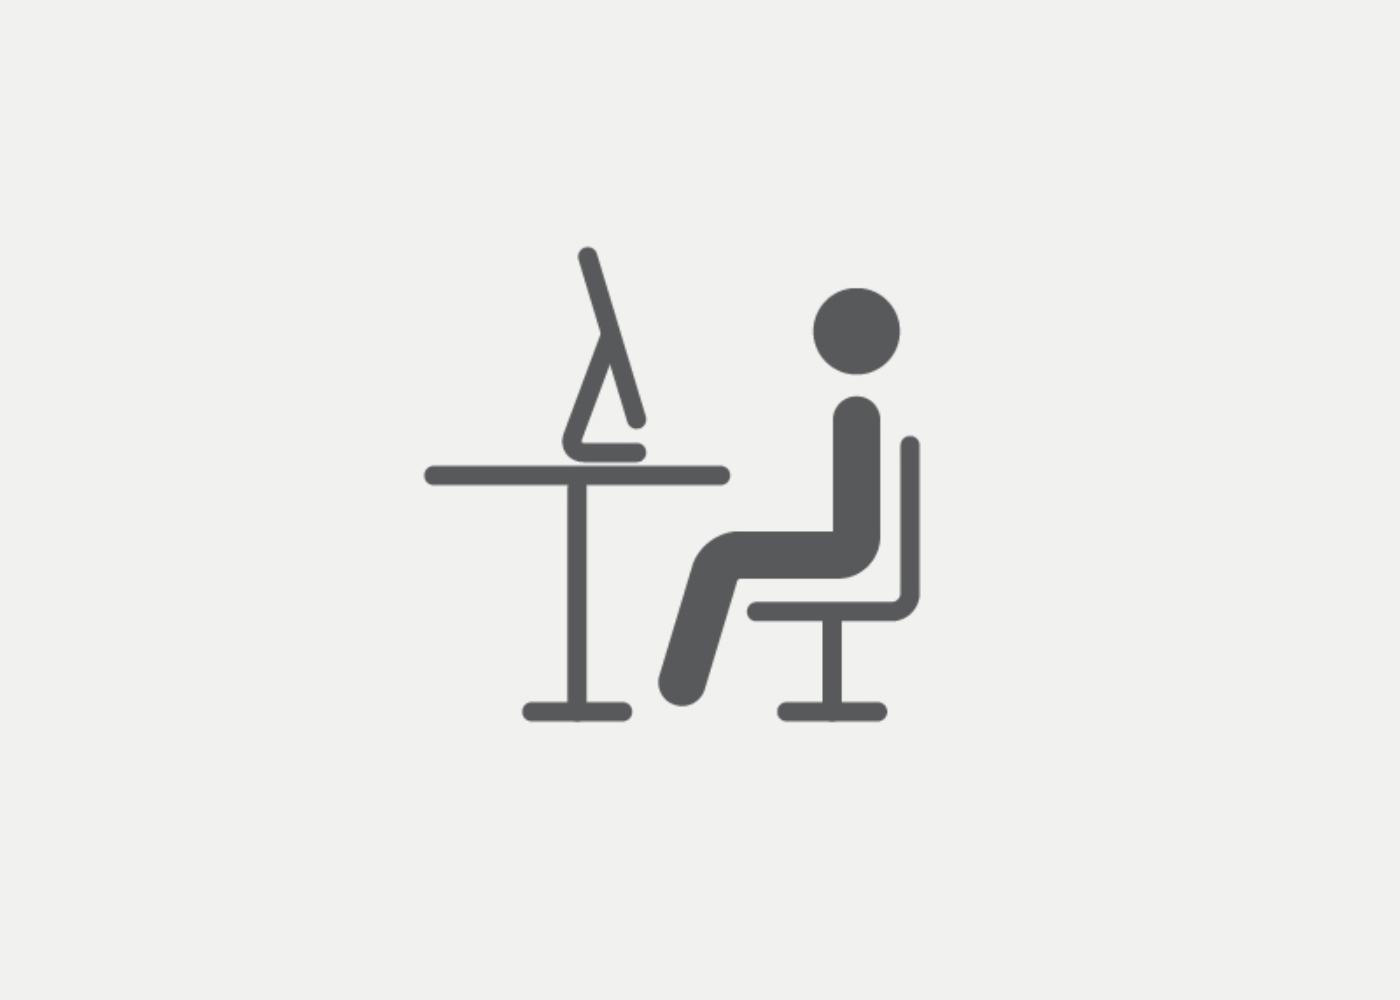 naem-research-quickpolls-2016-02-office-ergonomic-policies-700x500